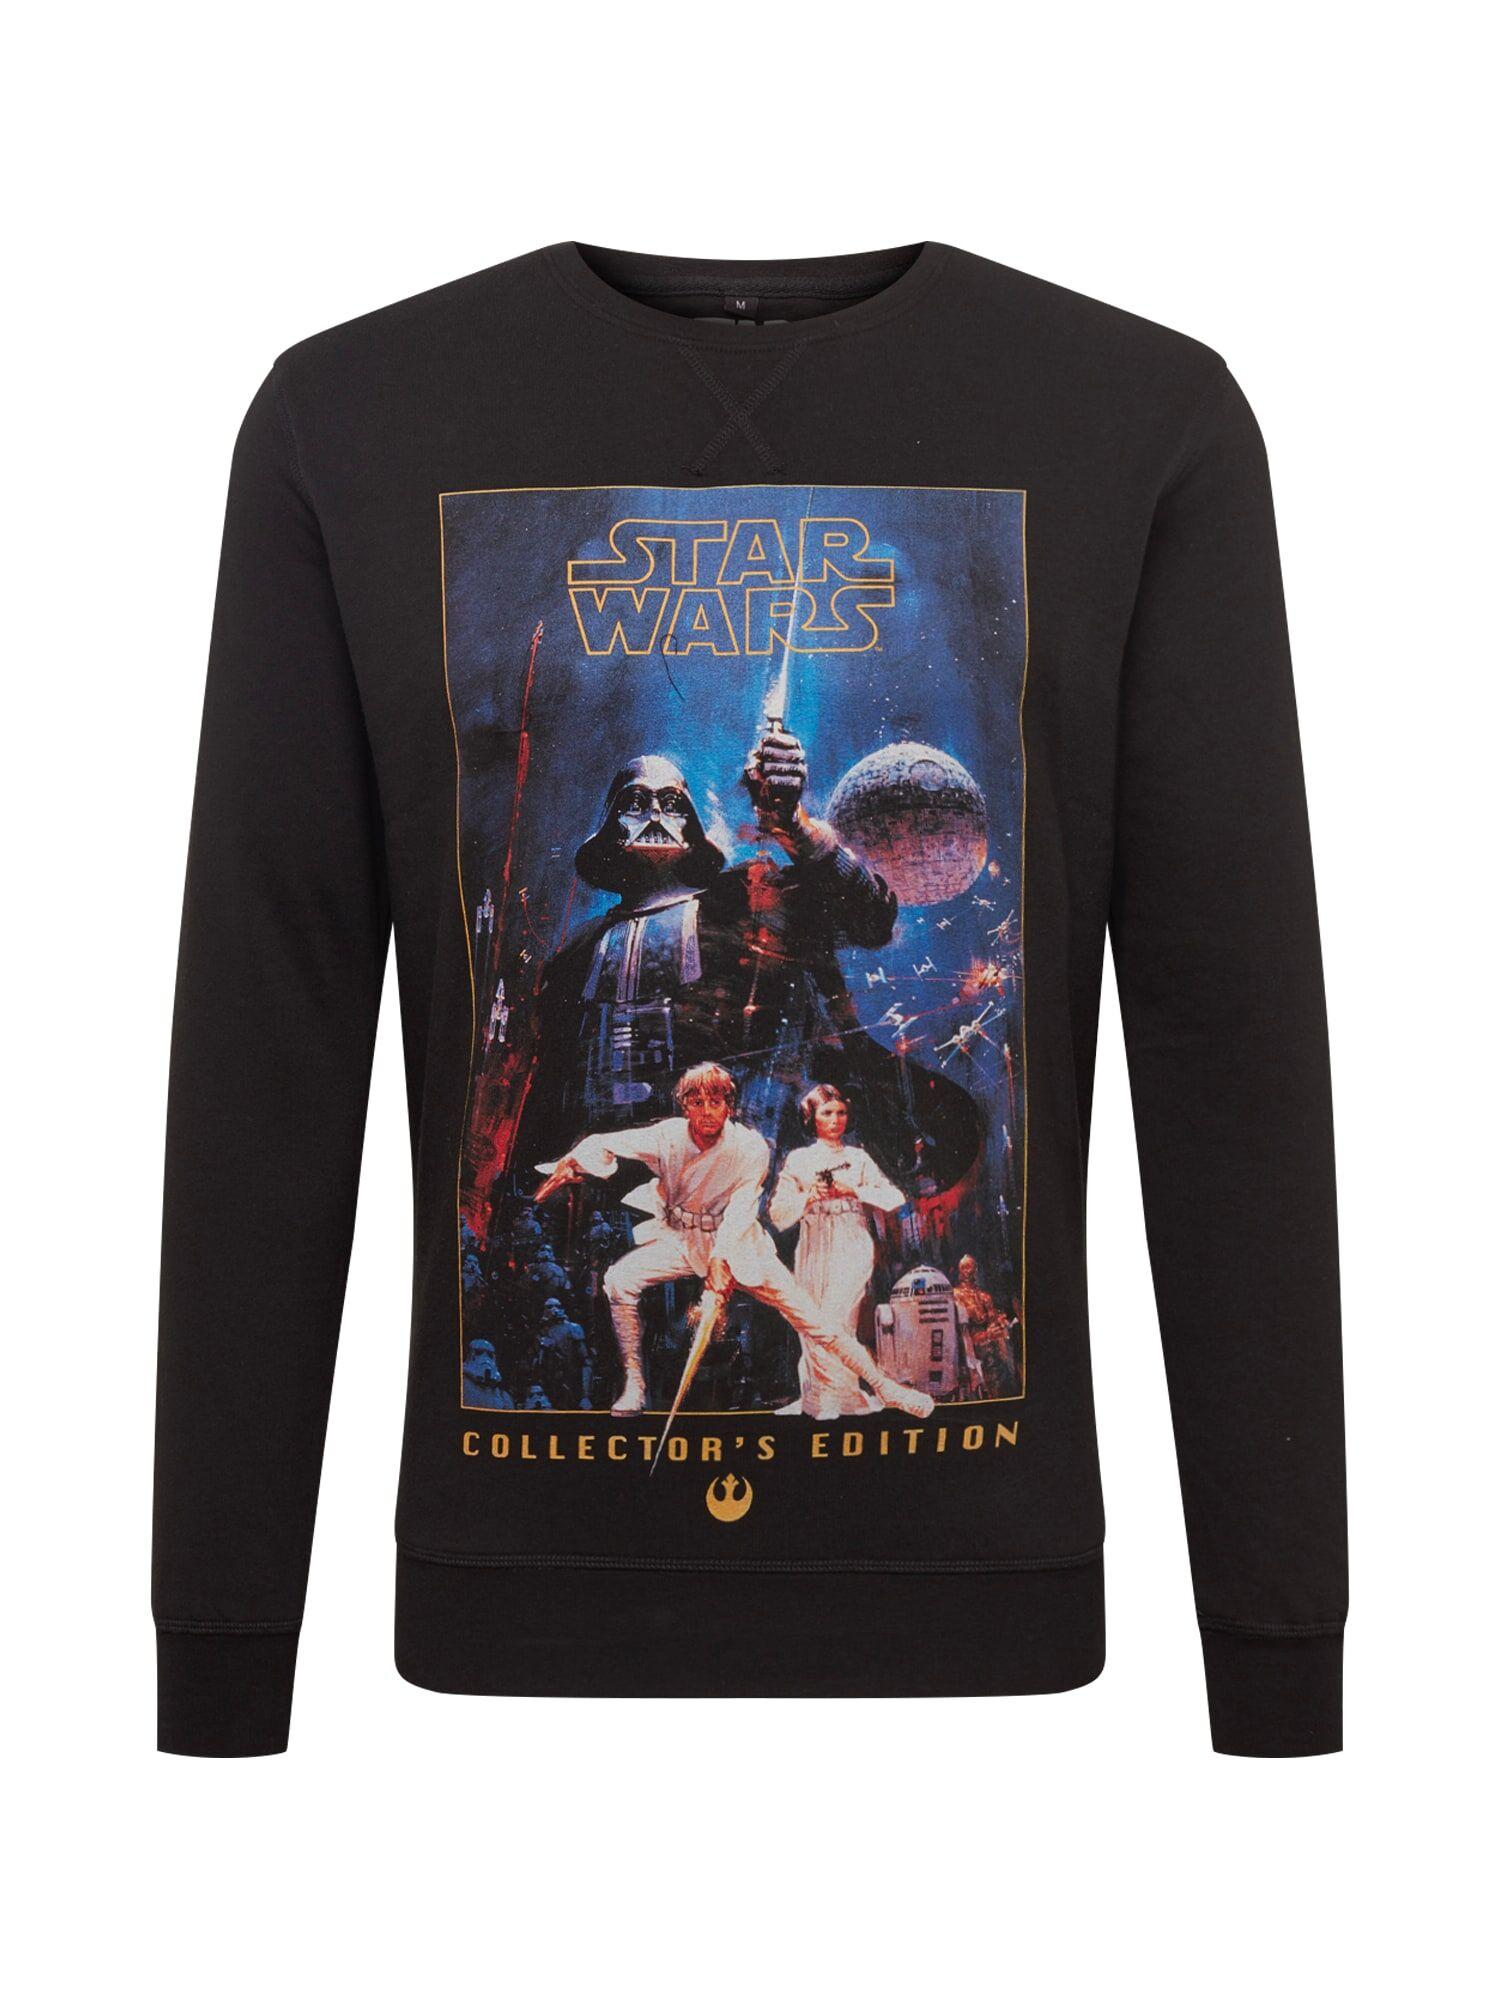 Tee Sweat-shirt 'Star Wars'  - Noir - Taille: S - male